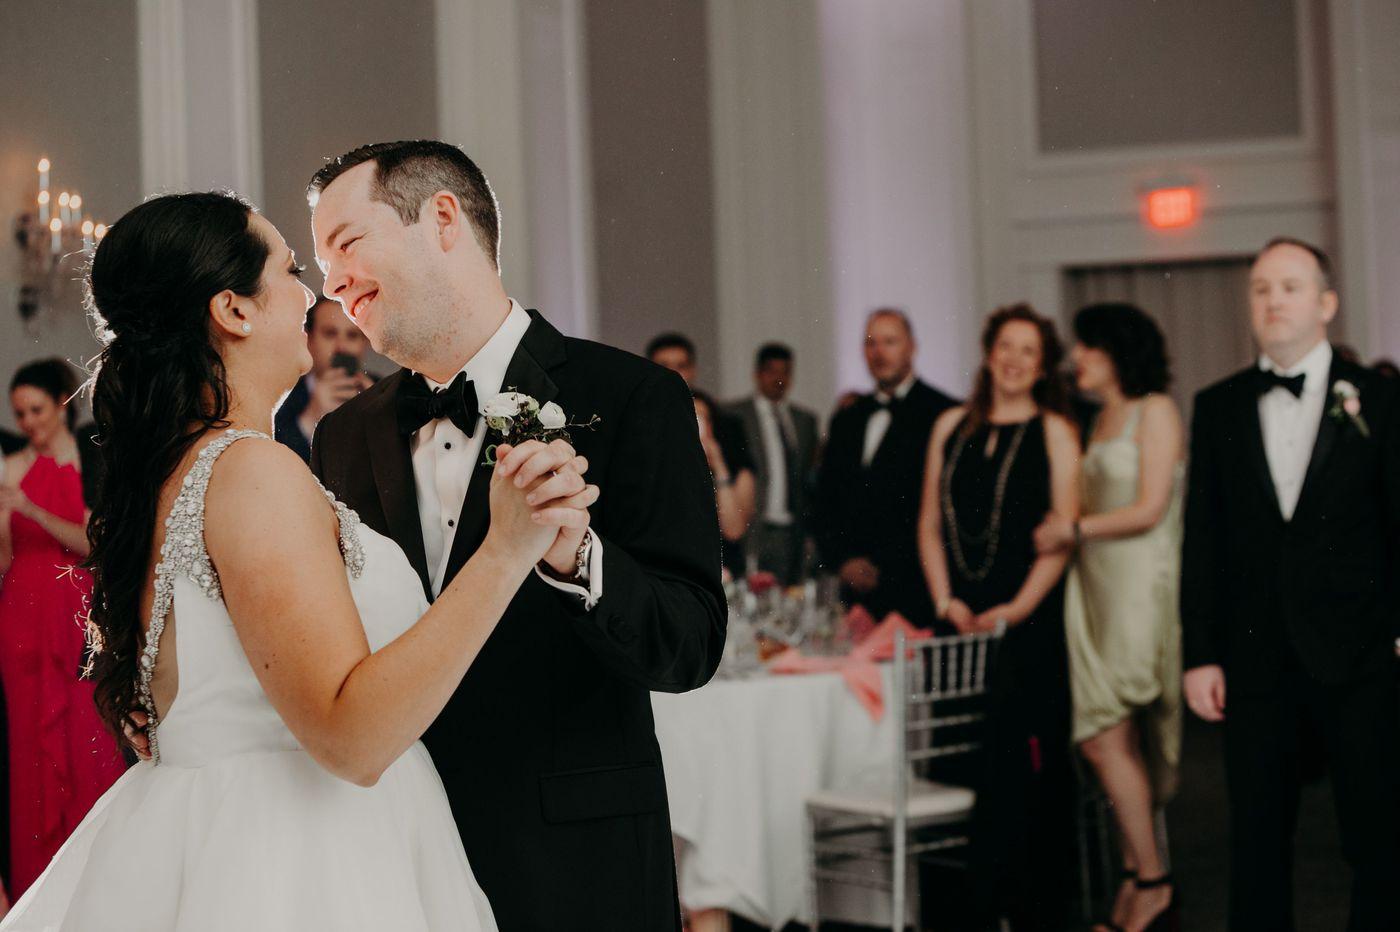 Philadelphia weddings: Michelle Robertson and Gavan Dunleavy